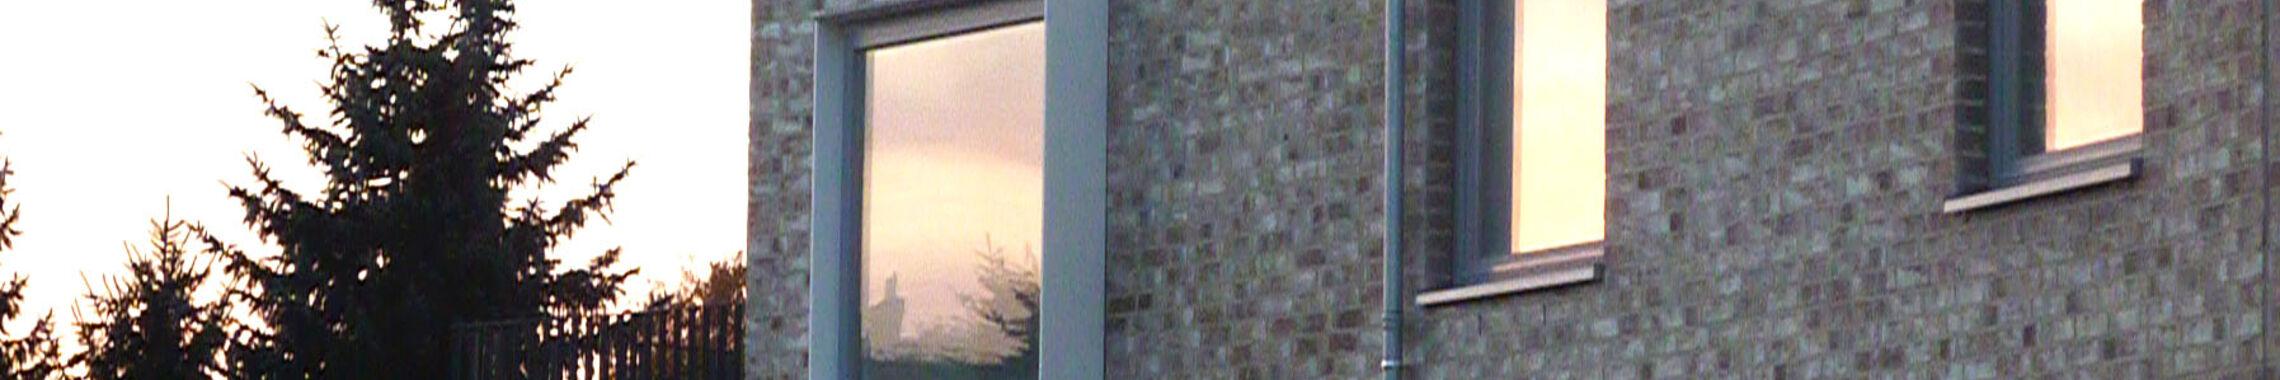 fami außen hofmauer kopfbild